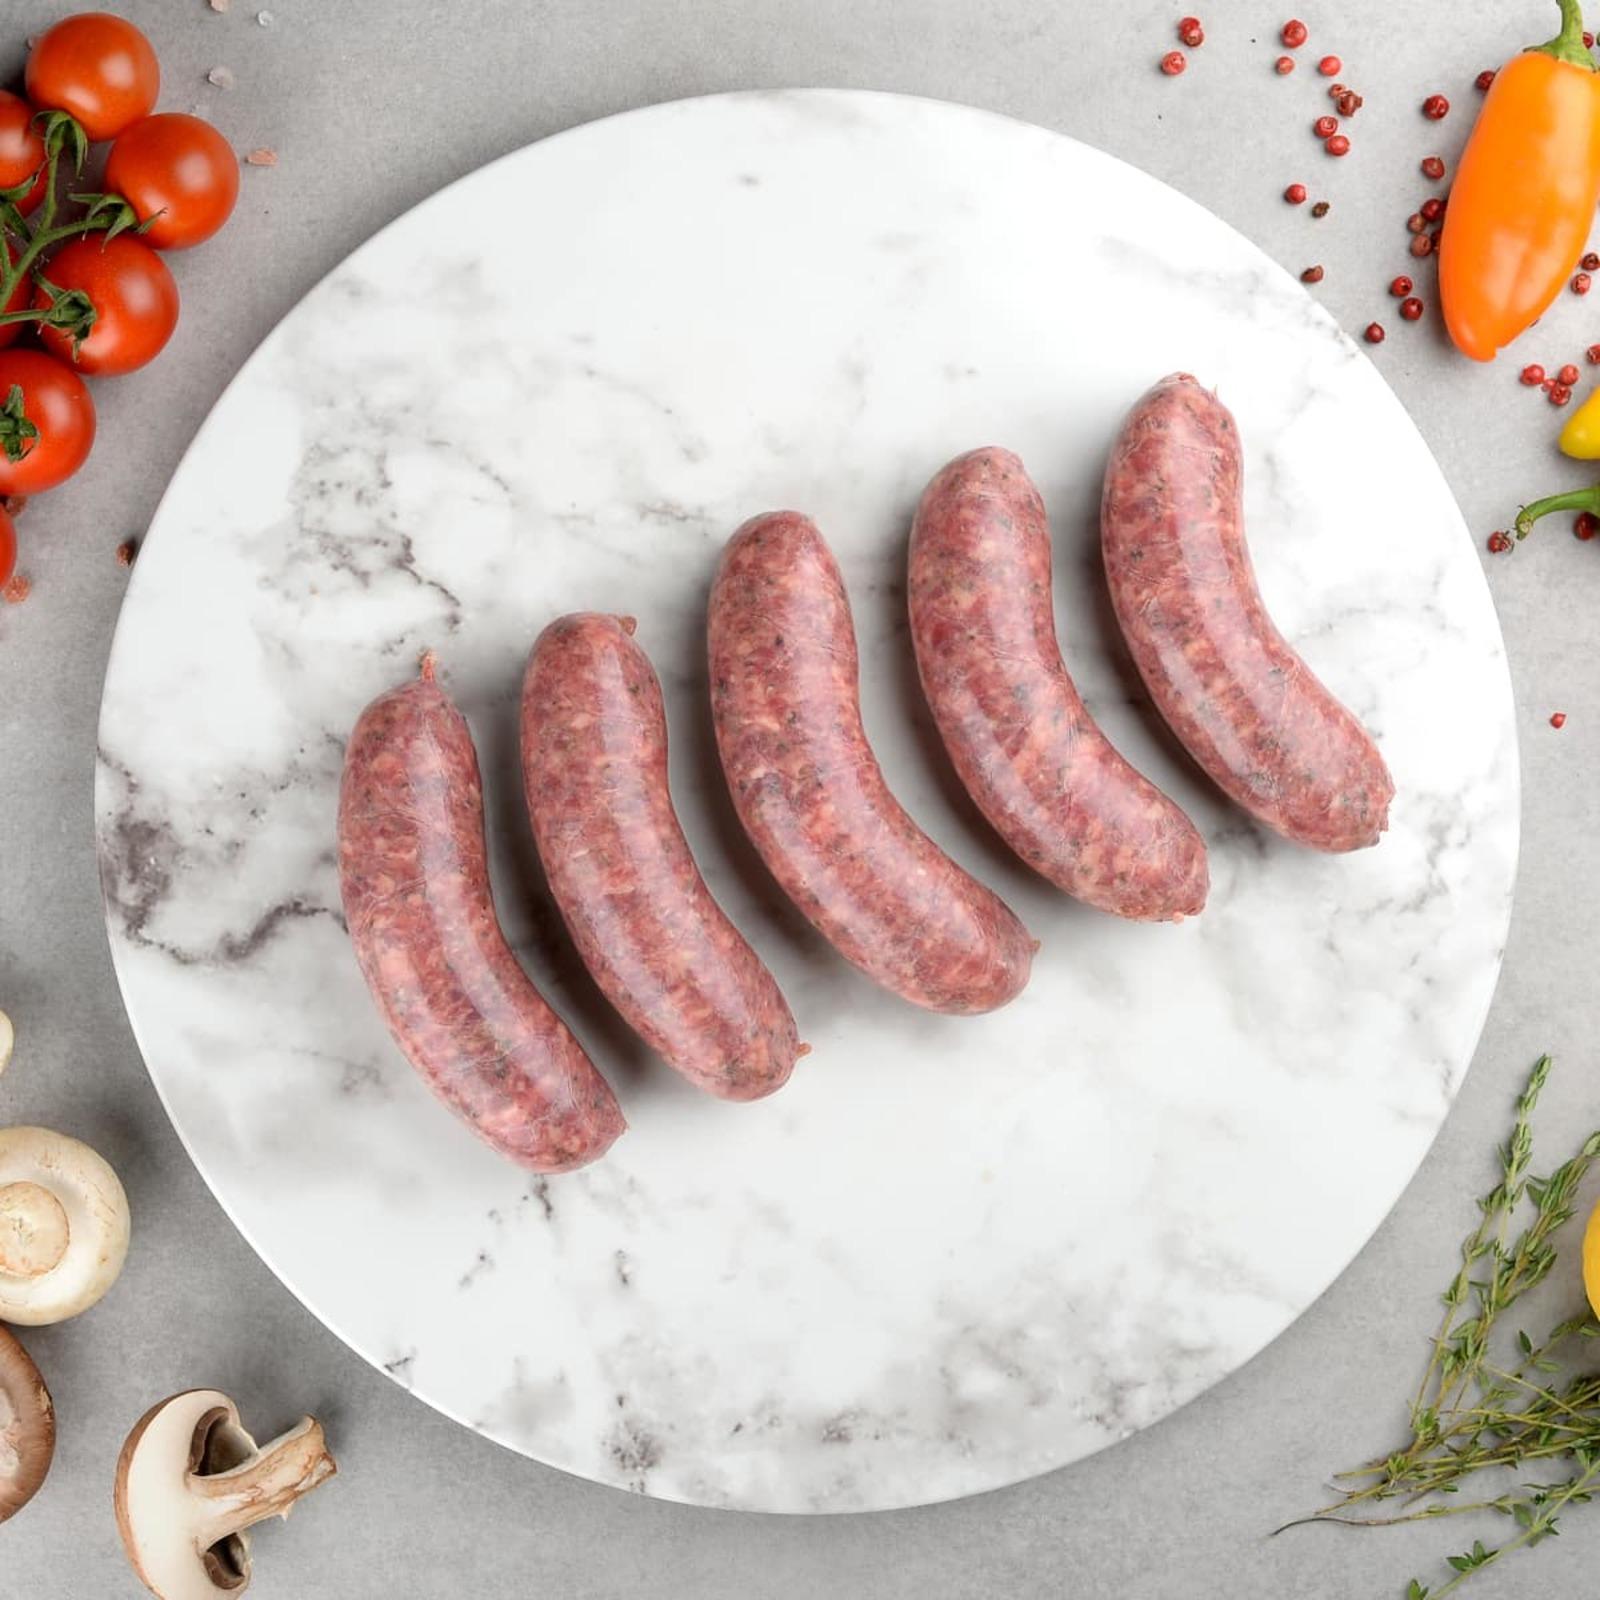 Ryan's Organic Beef Merlot And Cracked Pepper Sausage (Frozen)